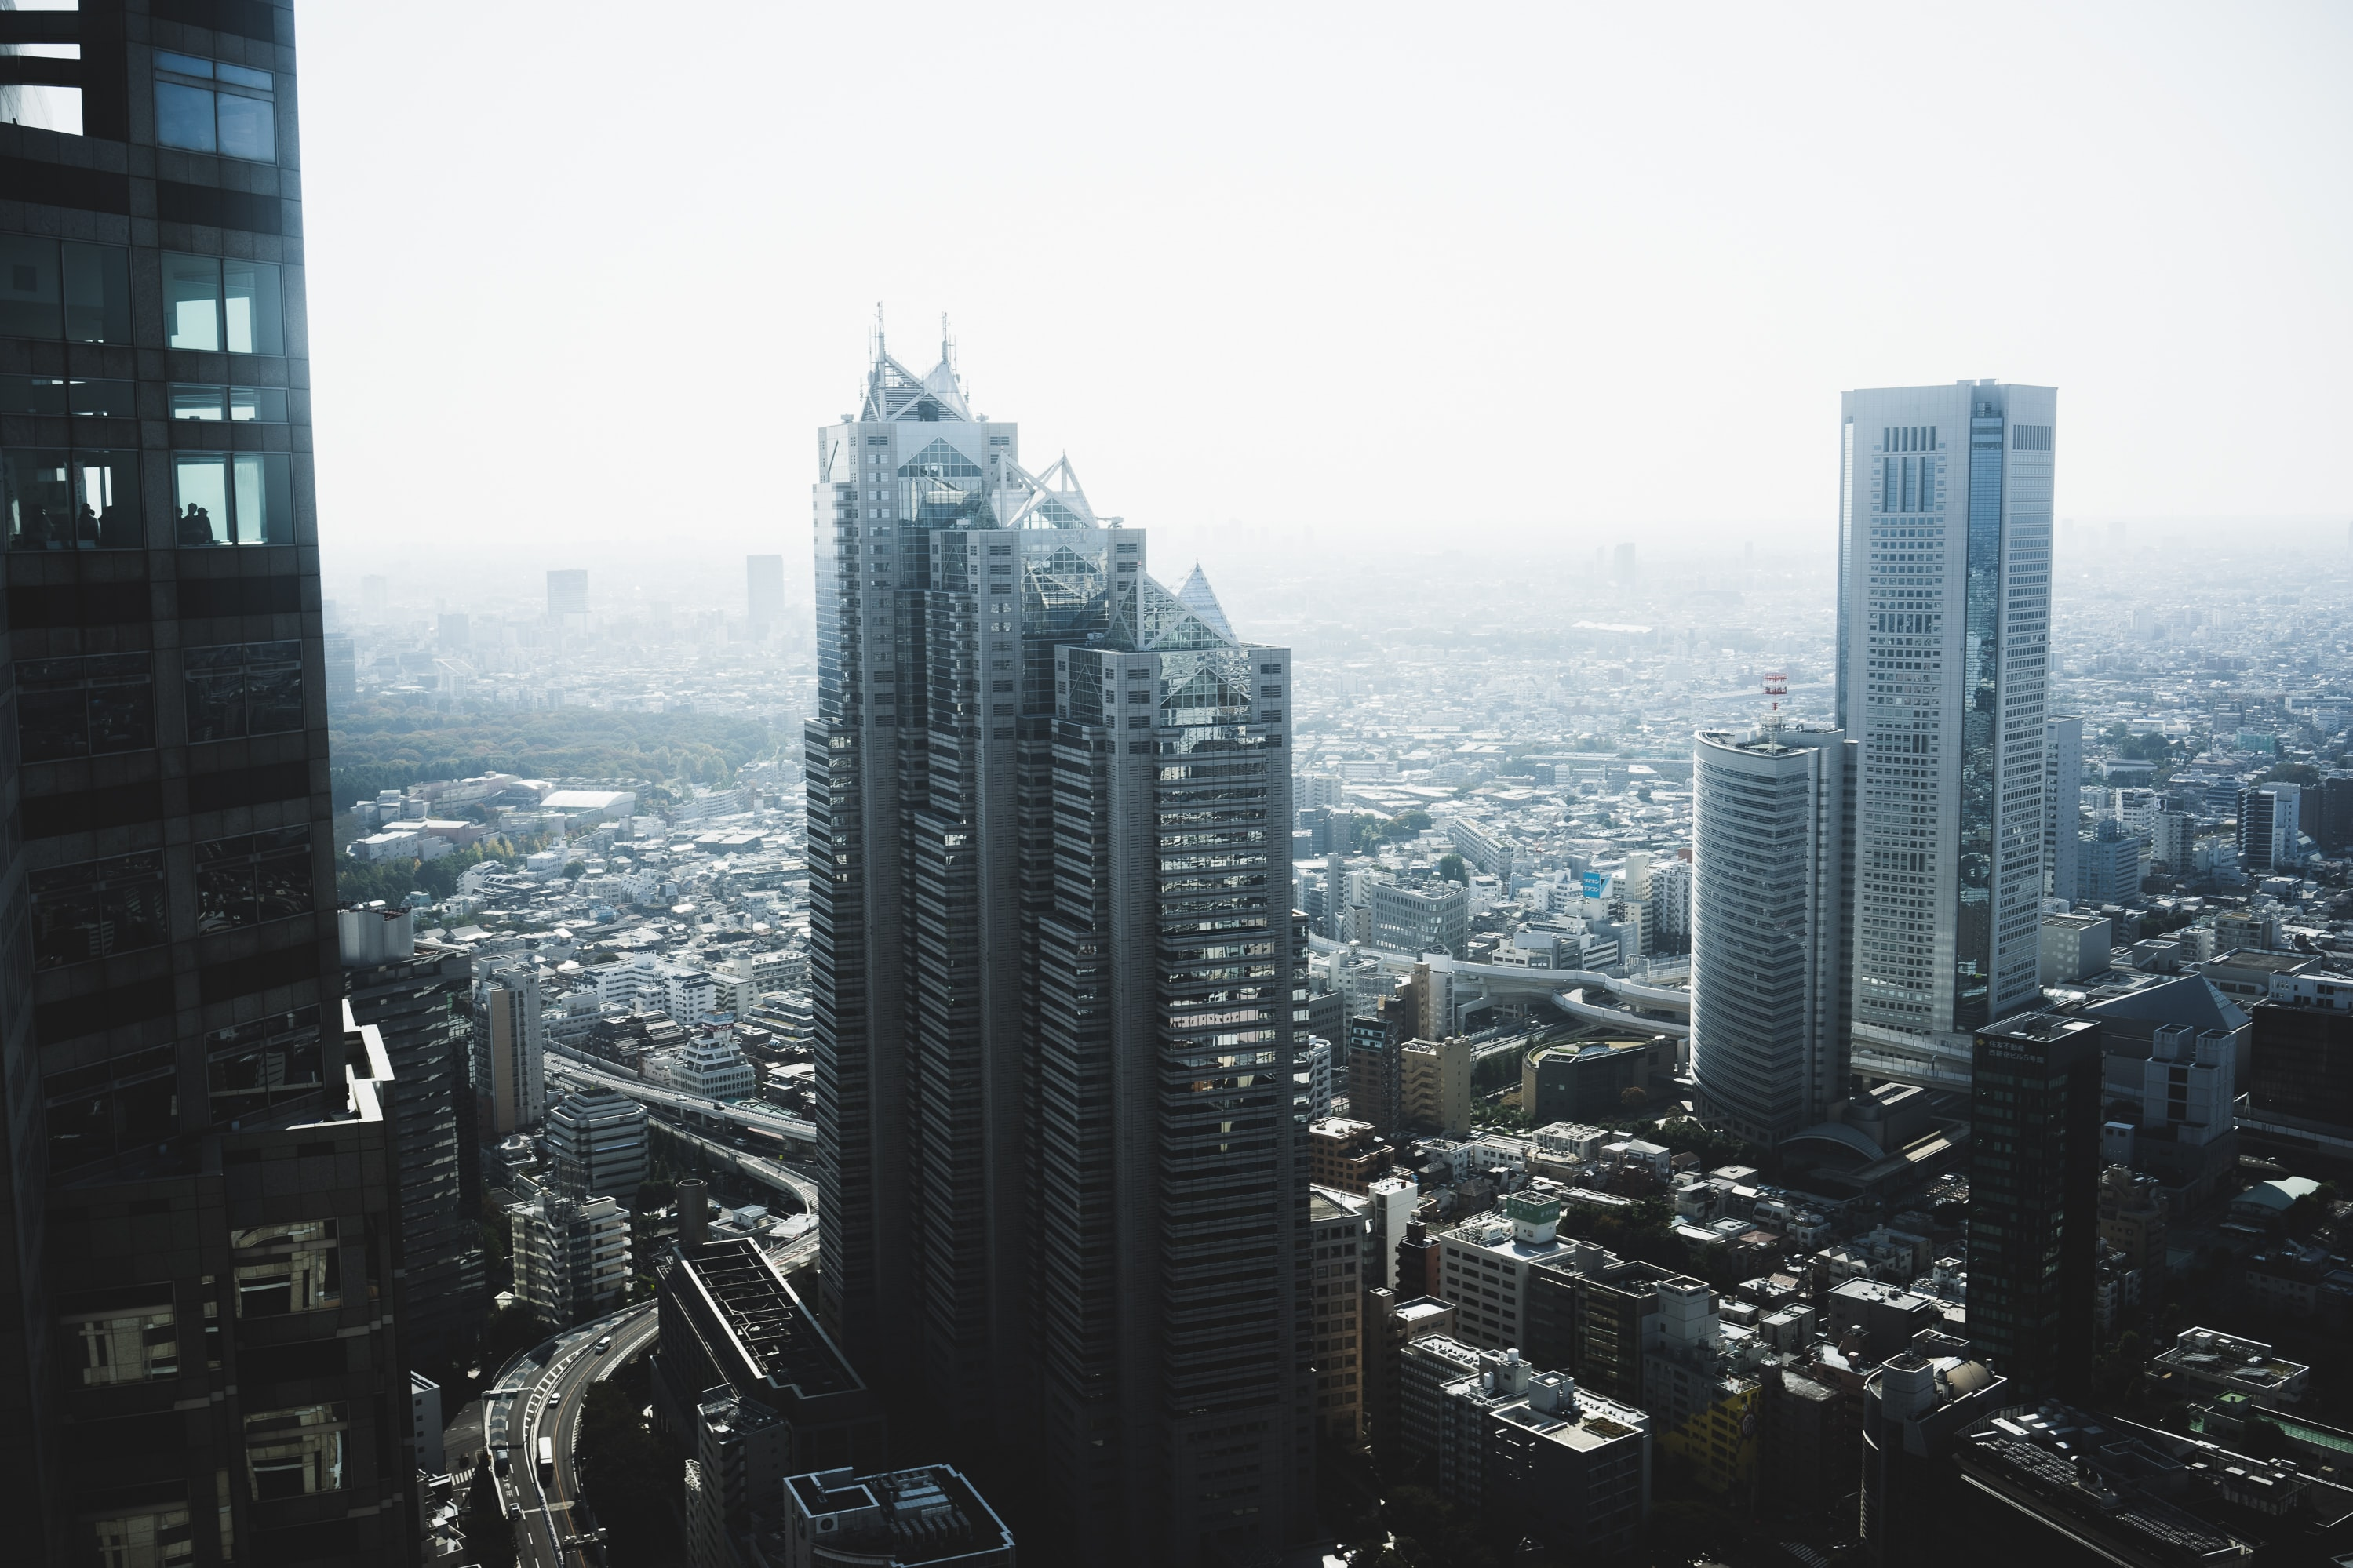 photo of concrete buildings under cloudy sky